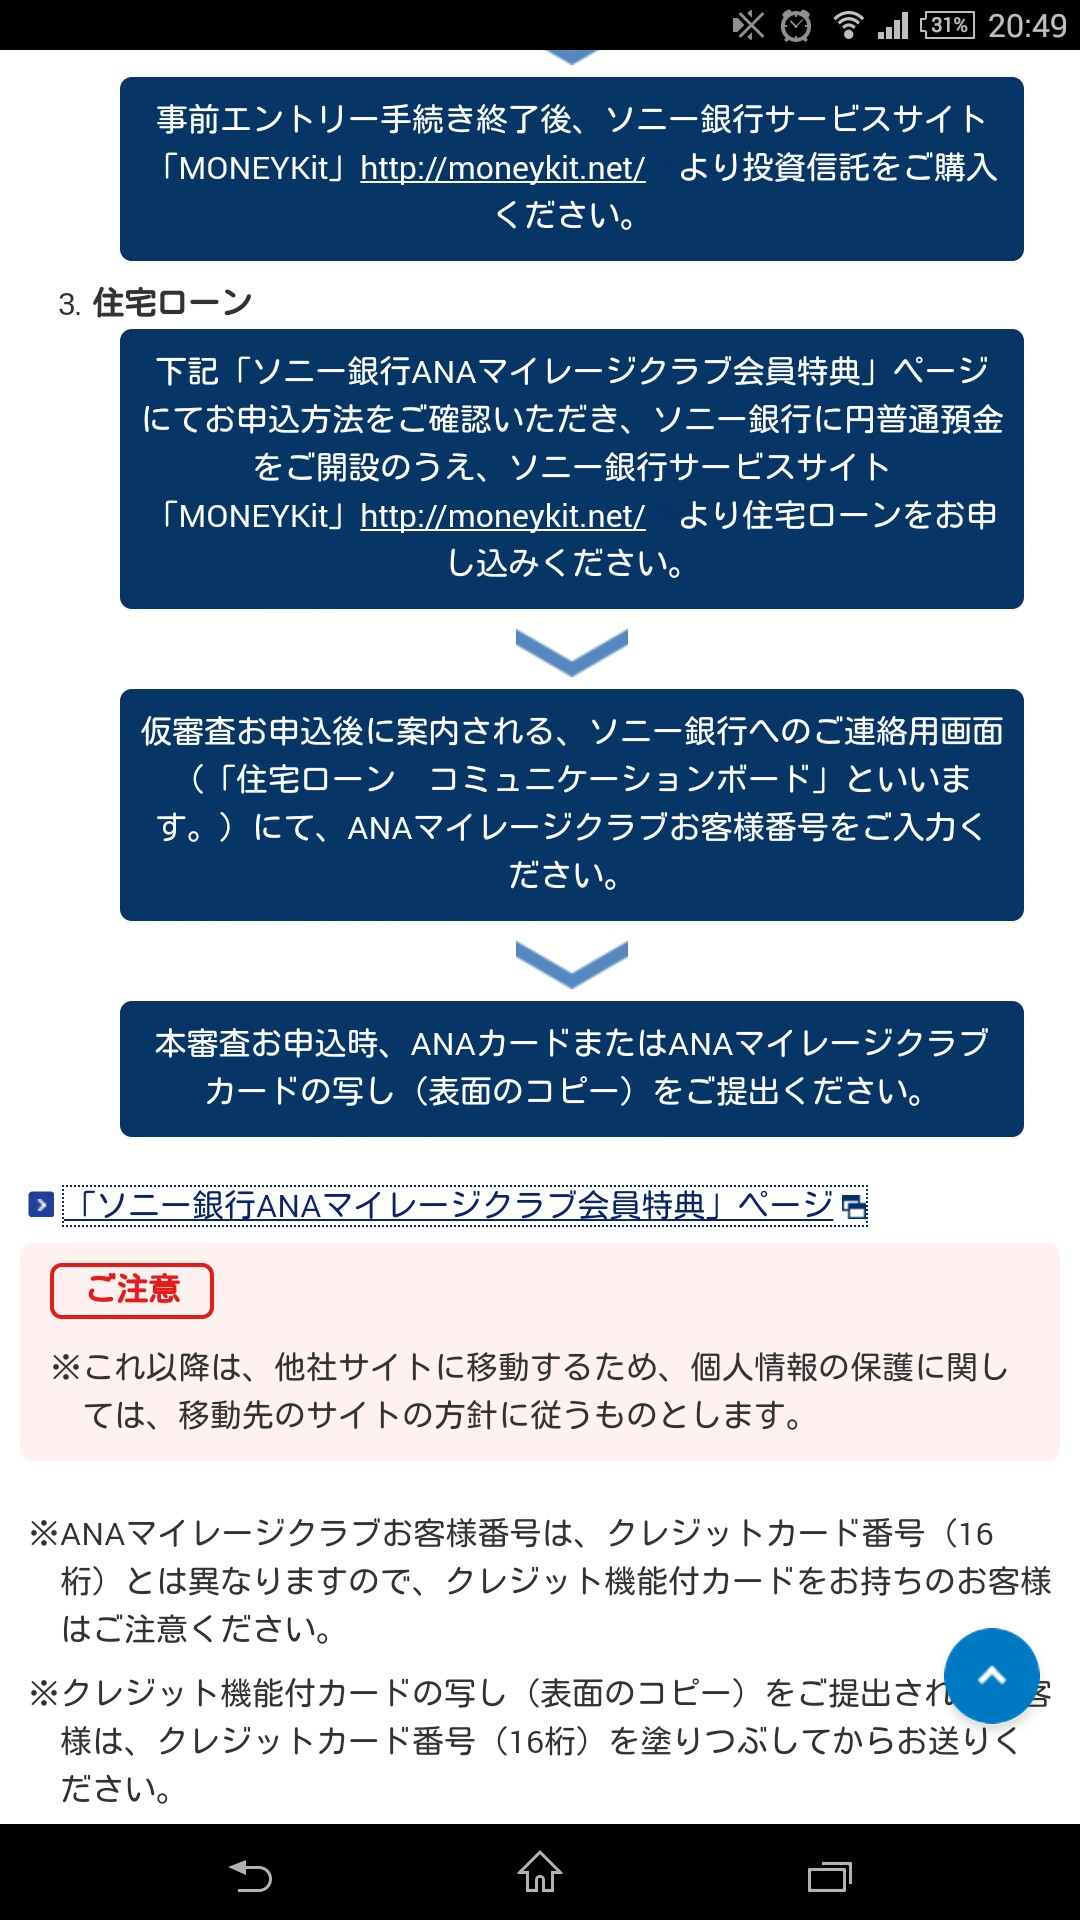 f:id:yoshiki808:20170219210346j:image